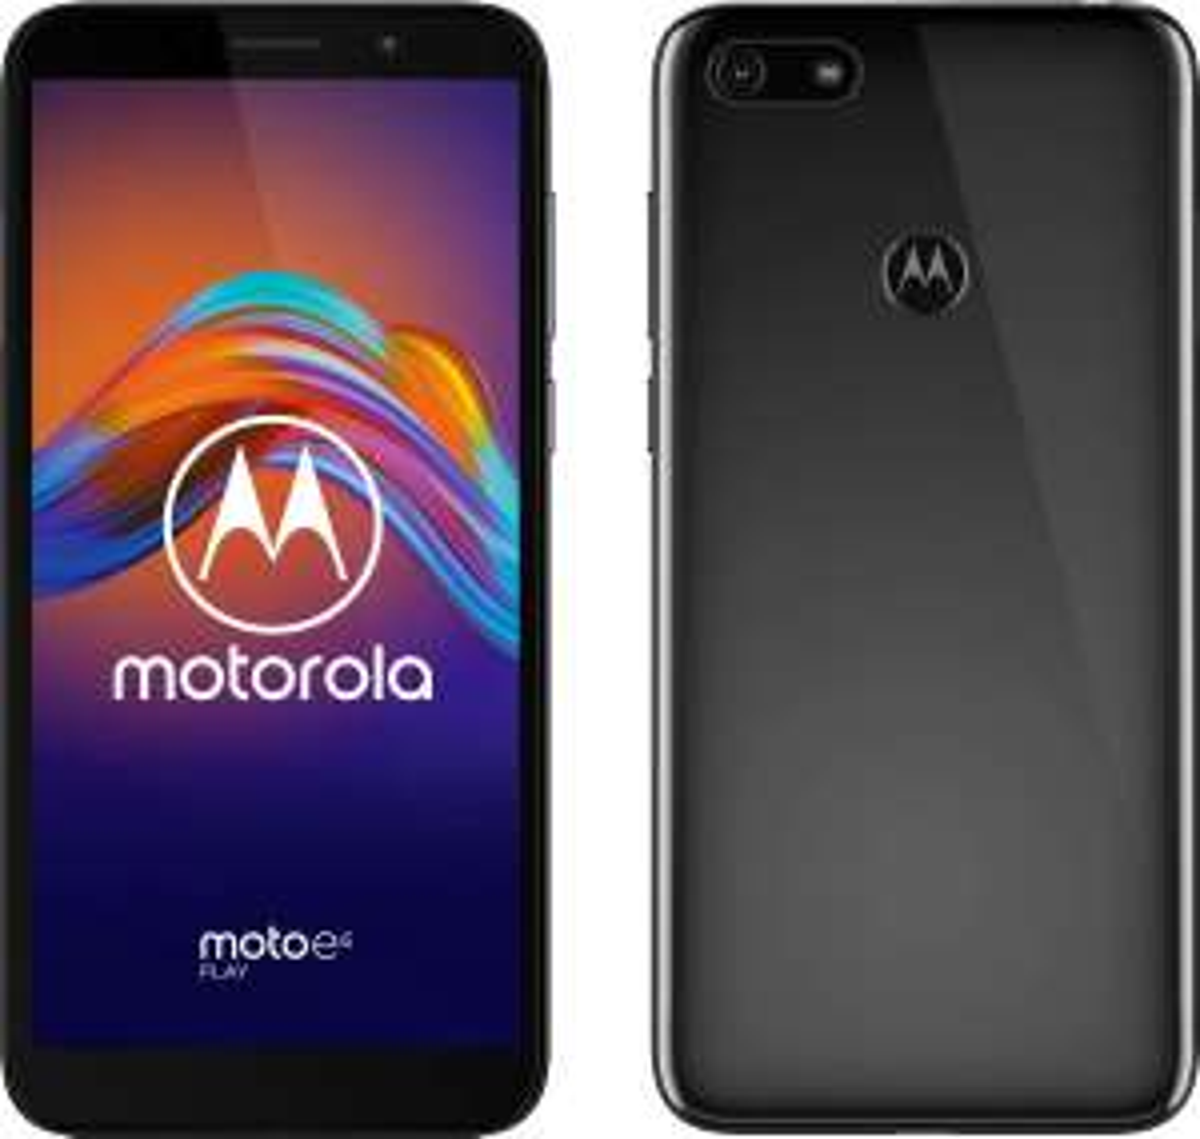 [OTTO UP Versandkosten-Flat] Motorola Moto e6 play + Schutzcover